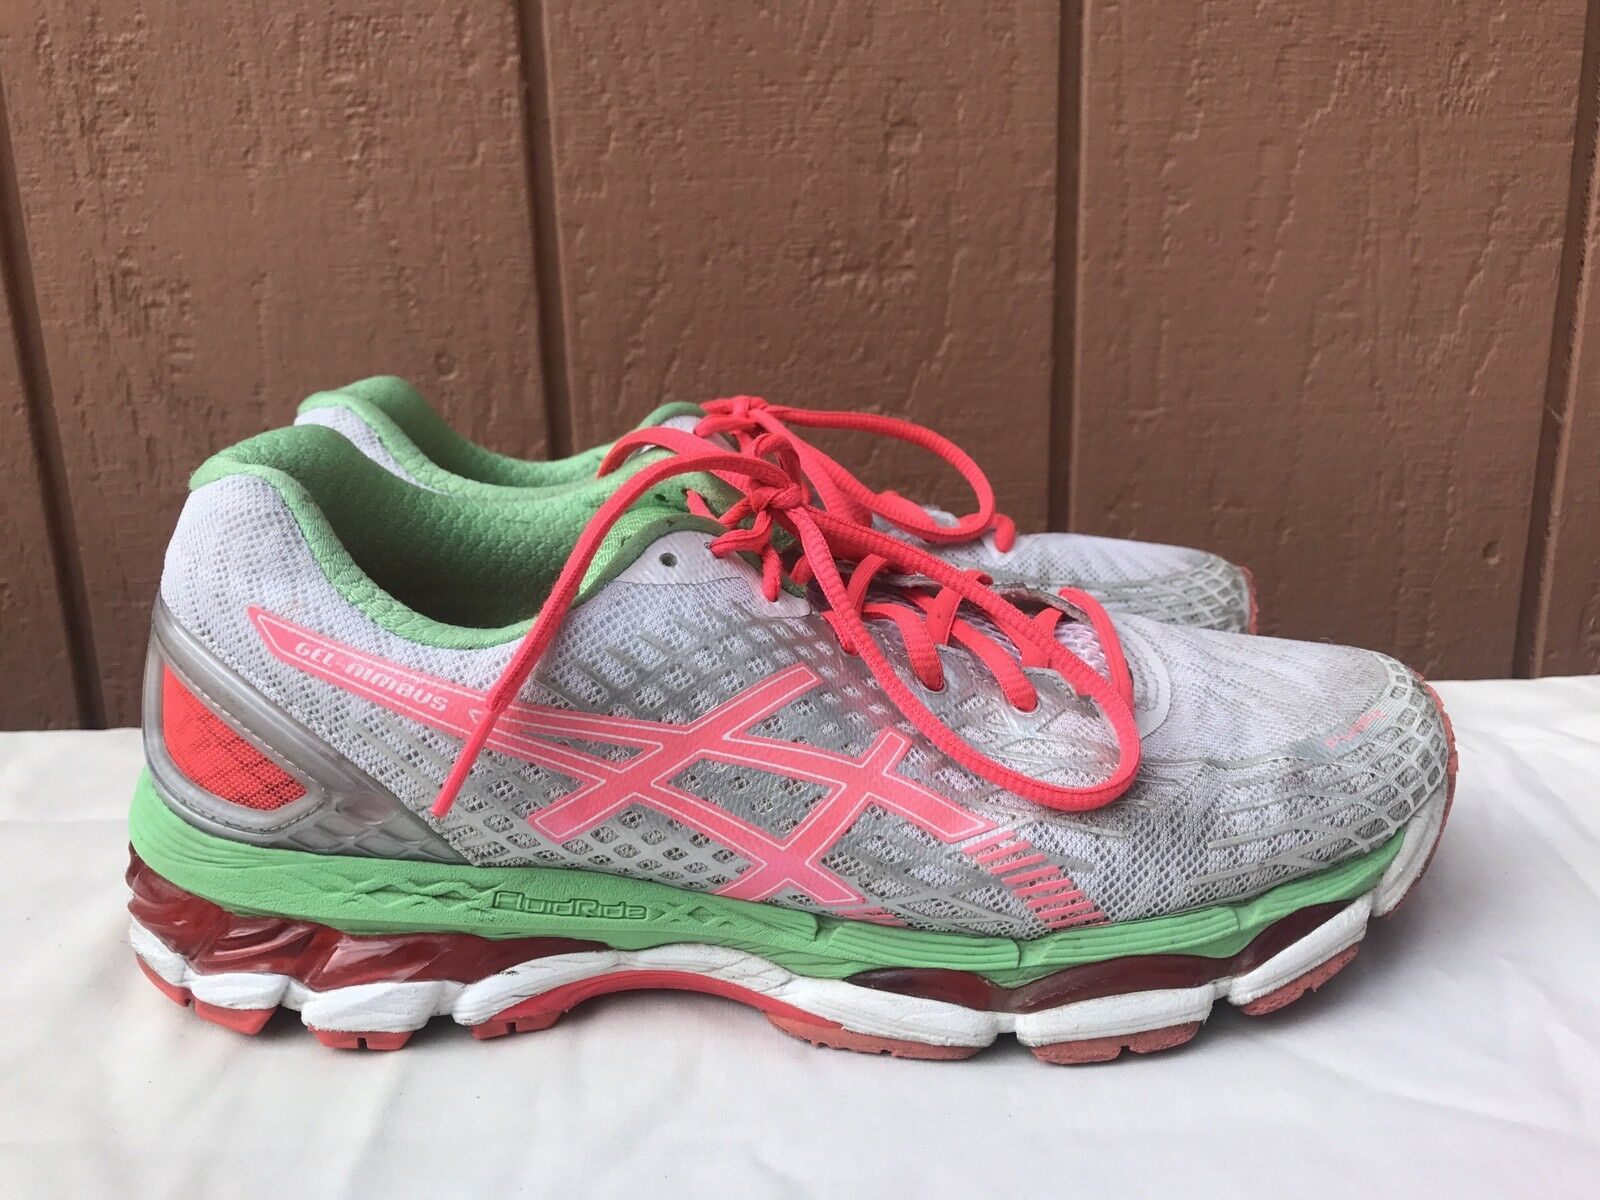 Asics Women's Gel Nimbus 17 US 10 Running Shoe White/Hot Coral/Apple T557N Price reduction Seasonal clearance sale